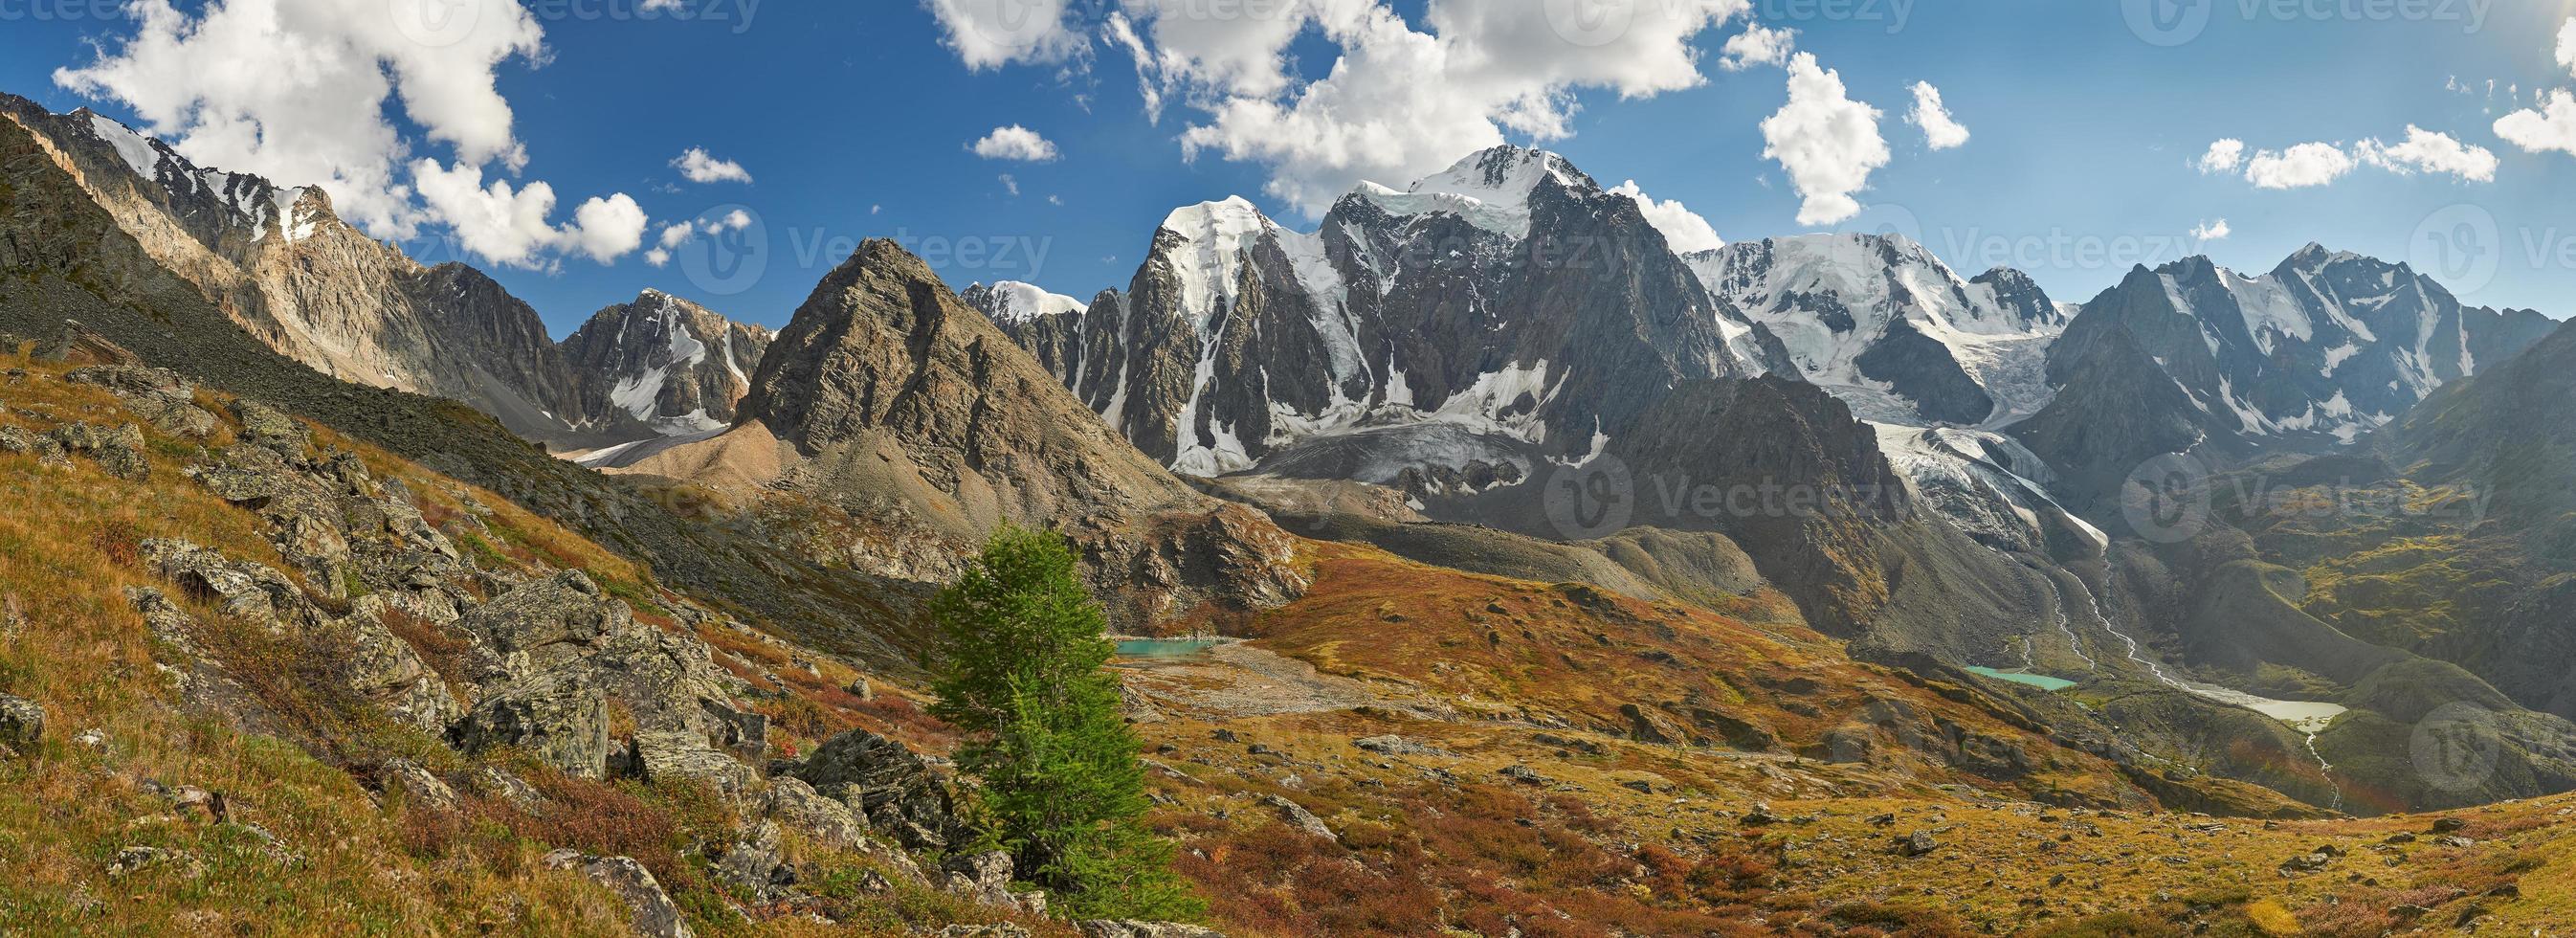 Altai Berge foto